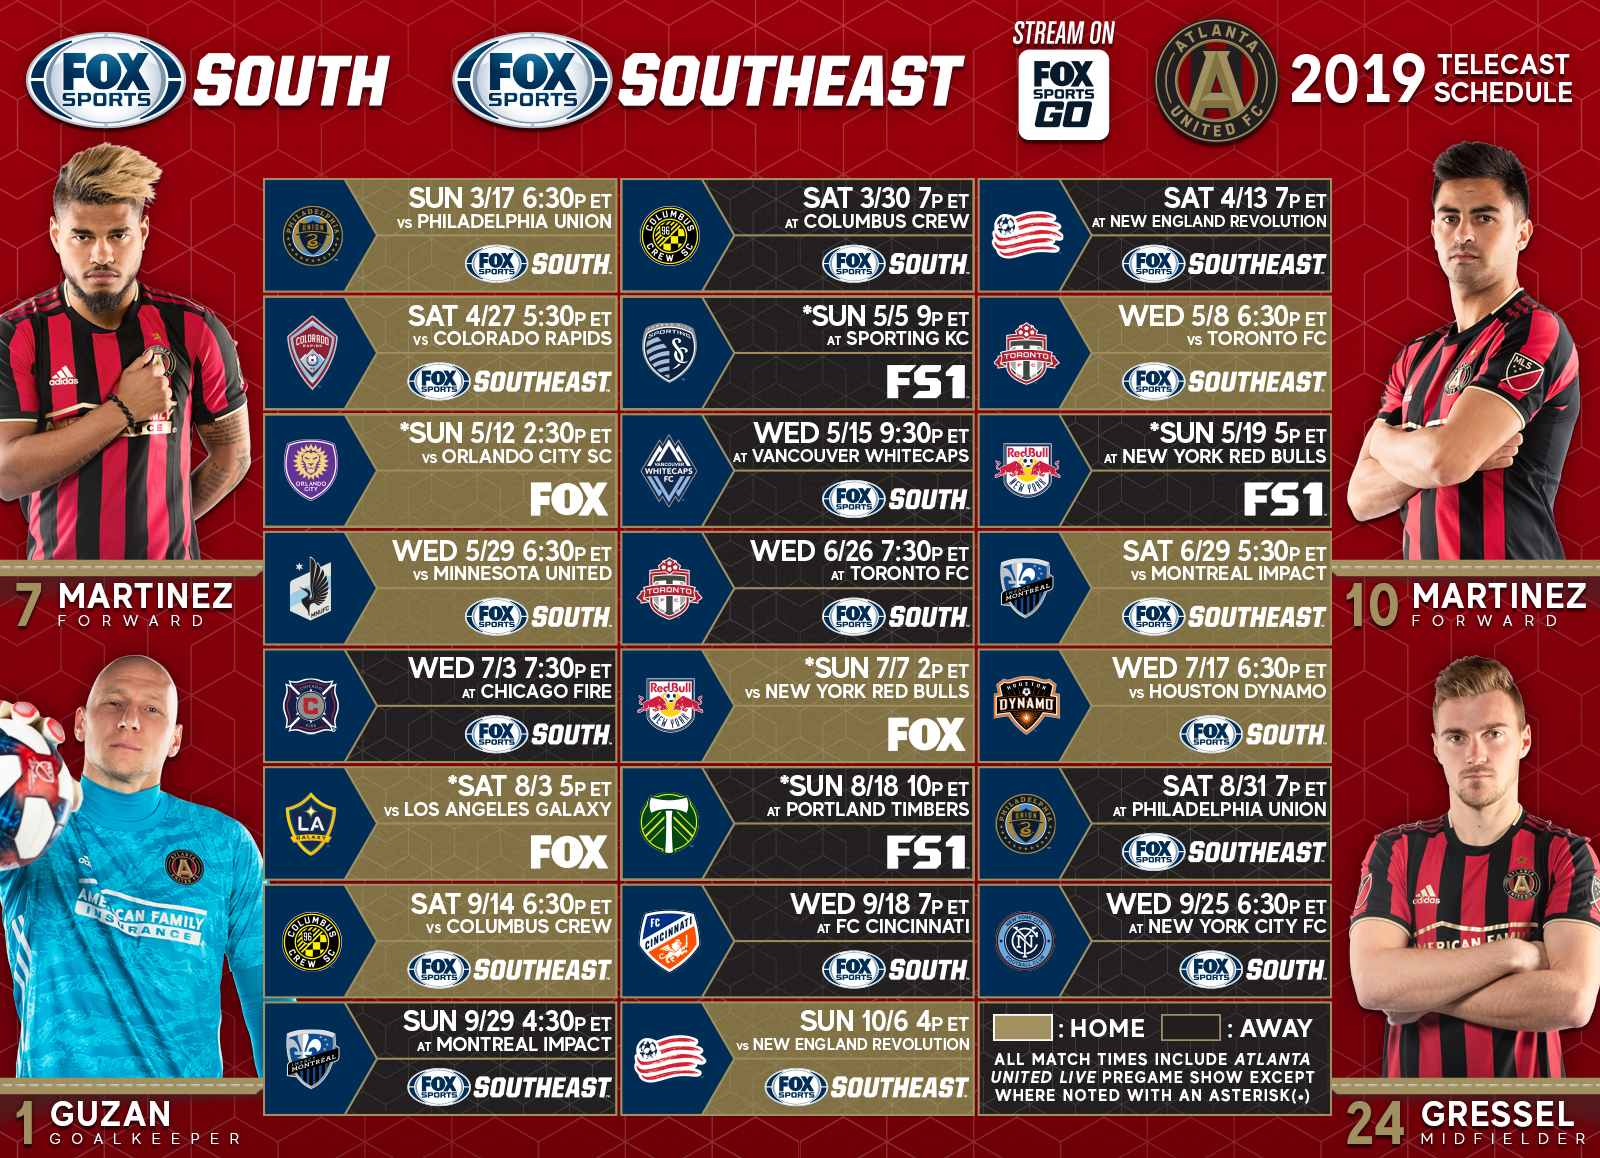 Atlanta United TV schedule on FOX Sports South, FOX Sports